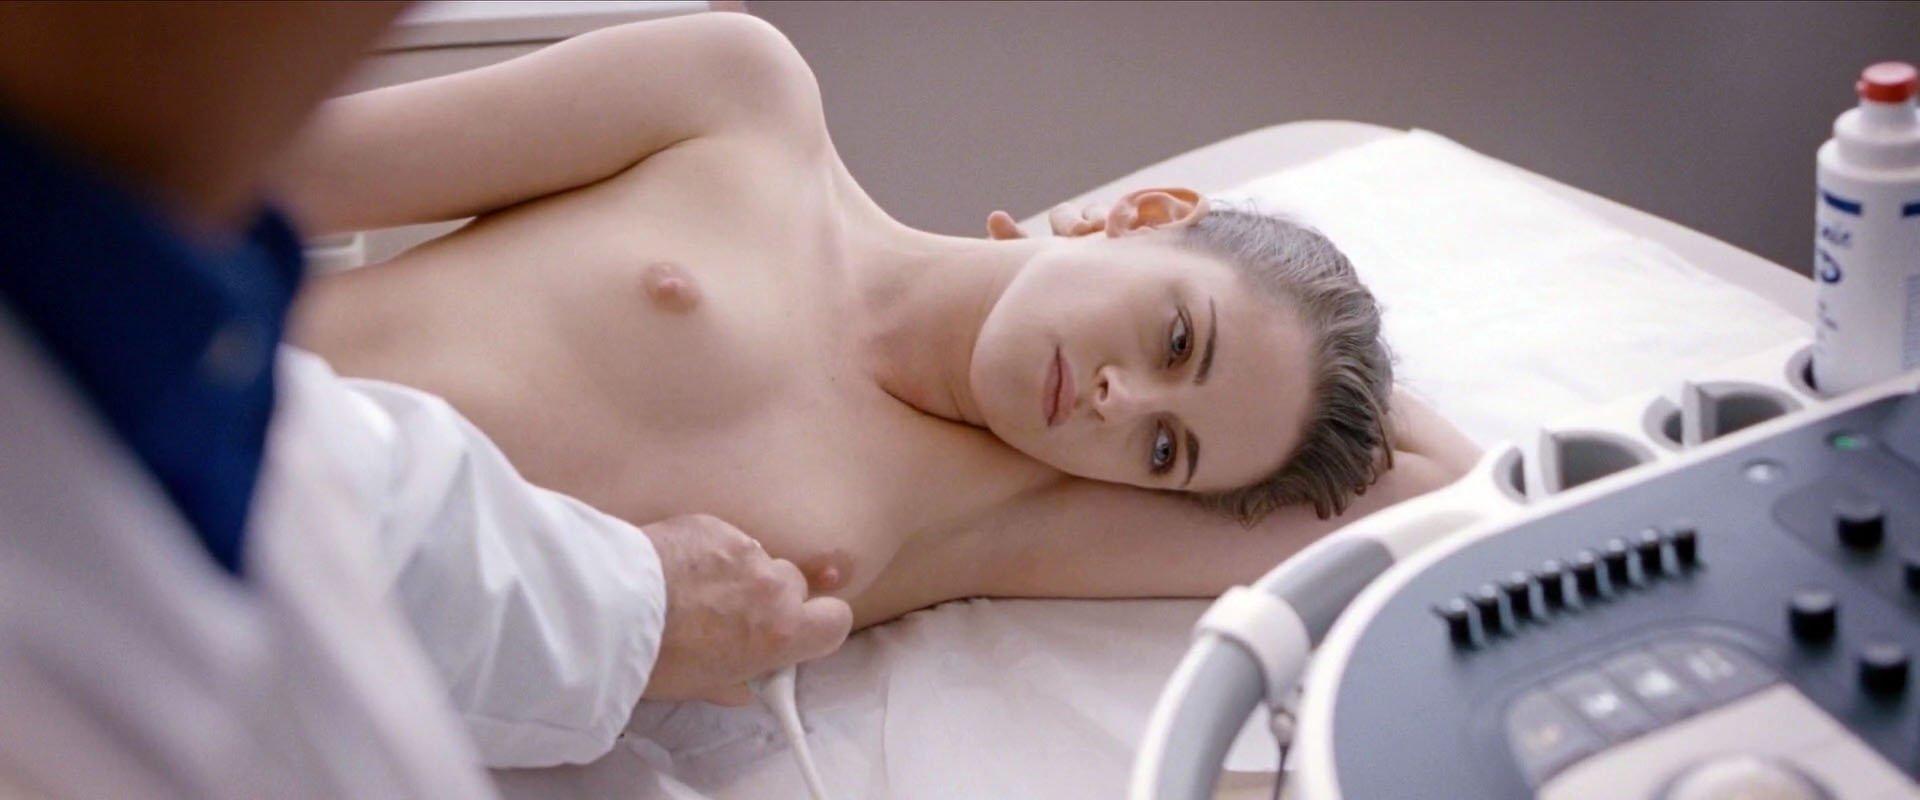 image Kristen stewart topless personal shopper